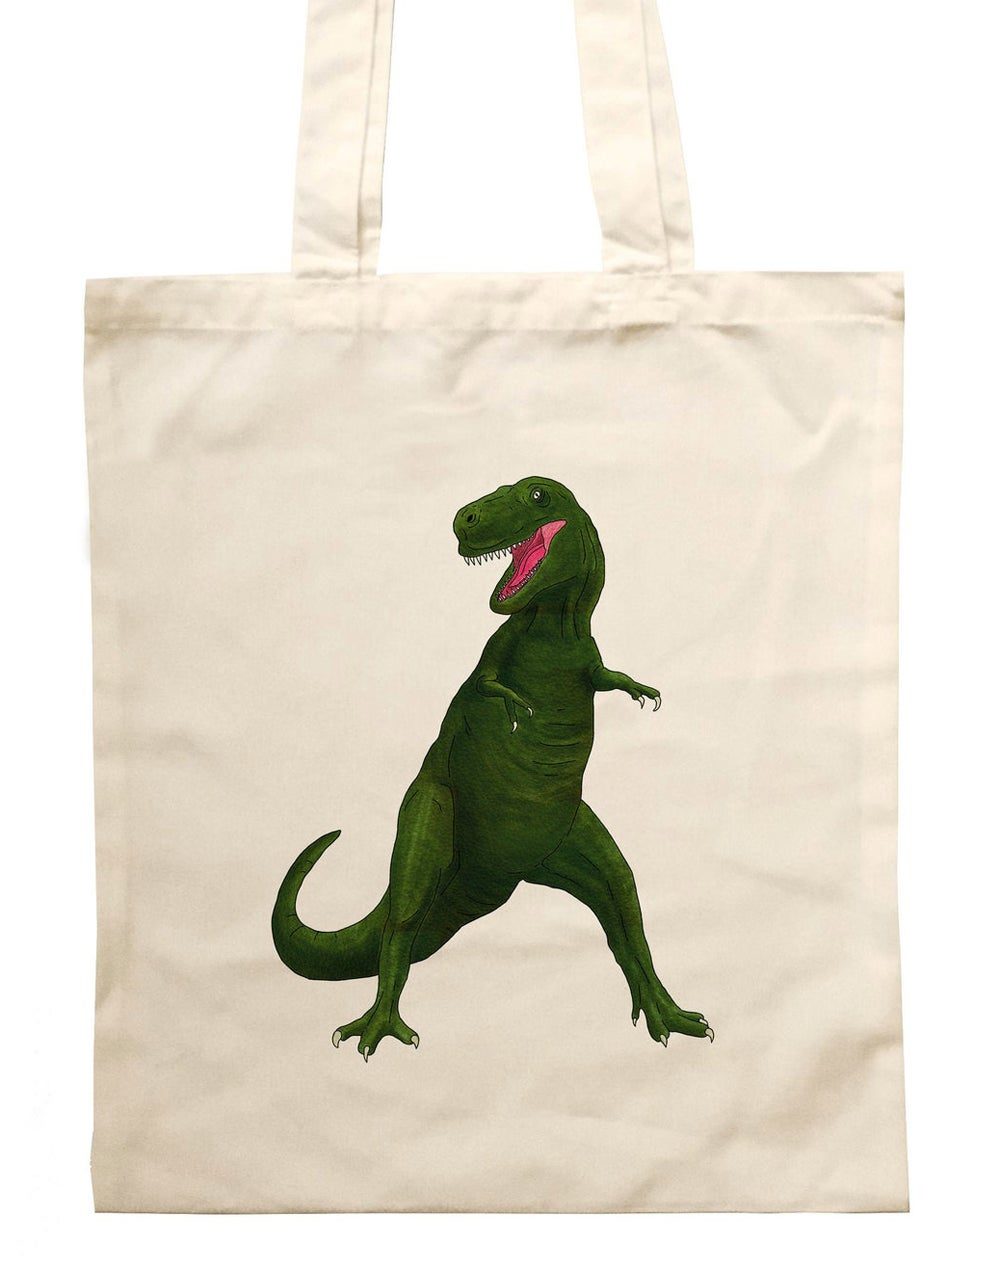 Image of Dinosaur Tote Bag